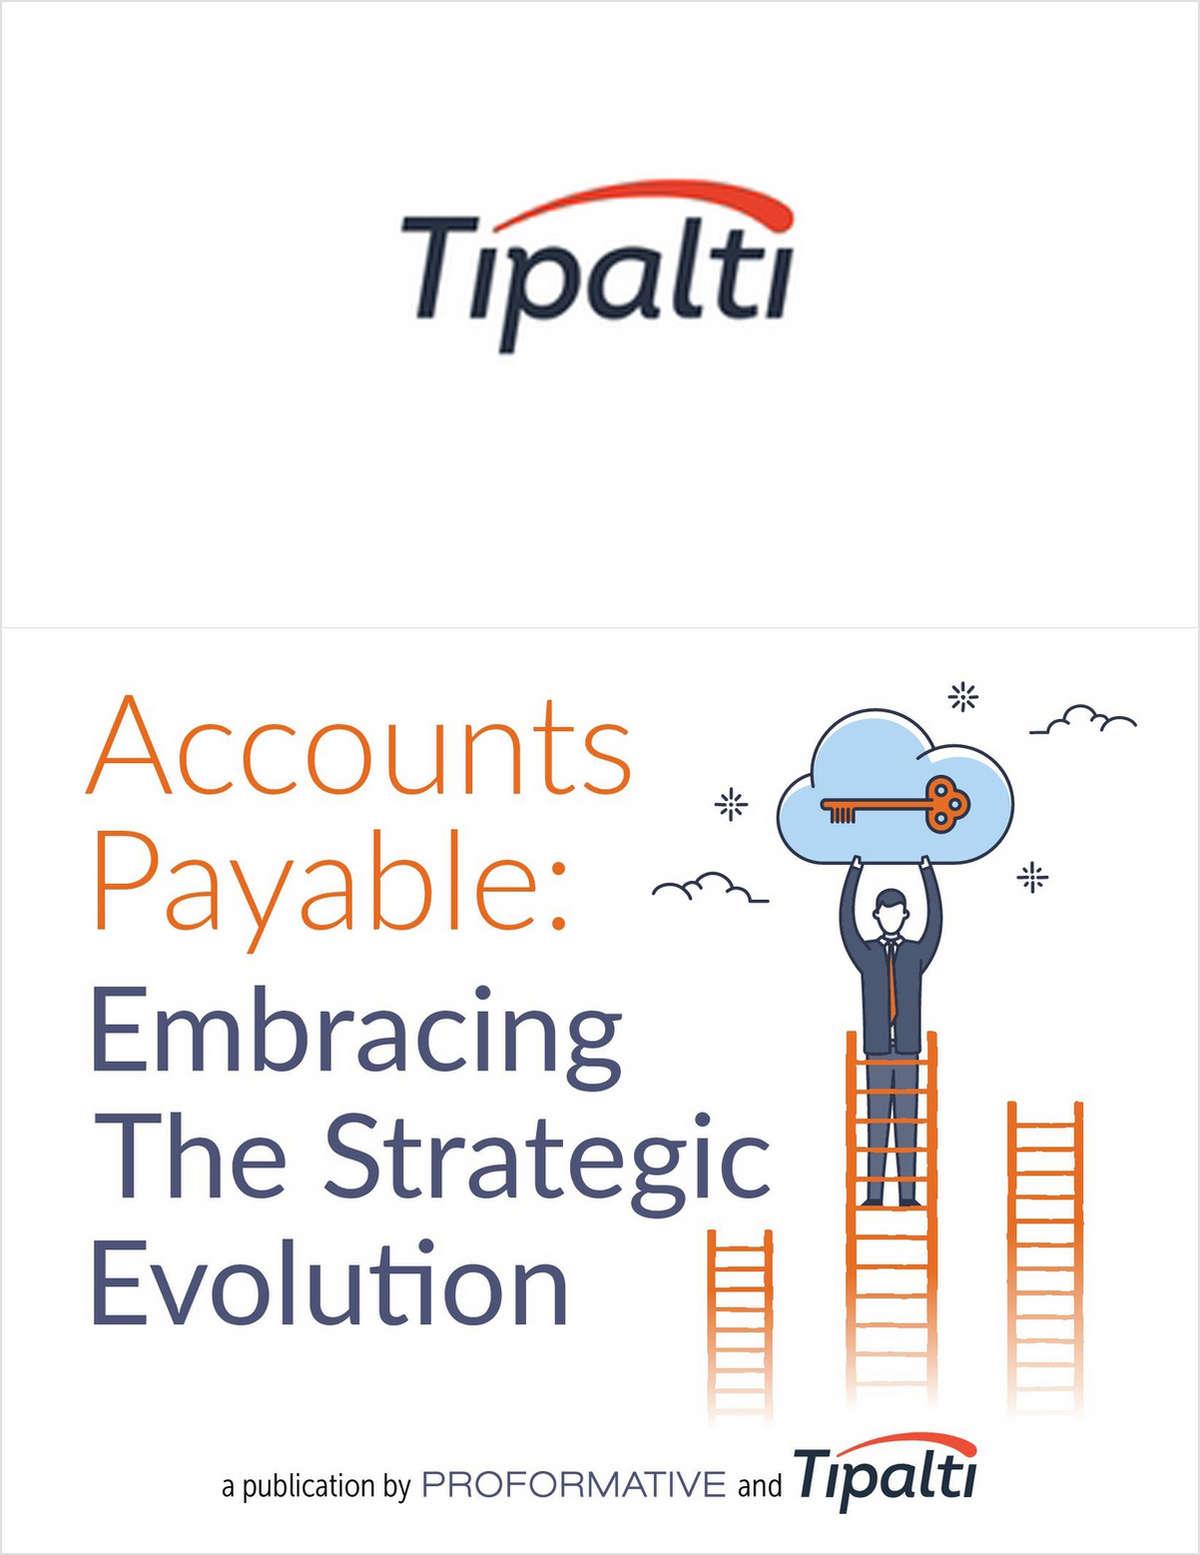 Accounts Payable: Embracing The Strategic Evolution